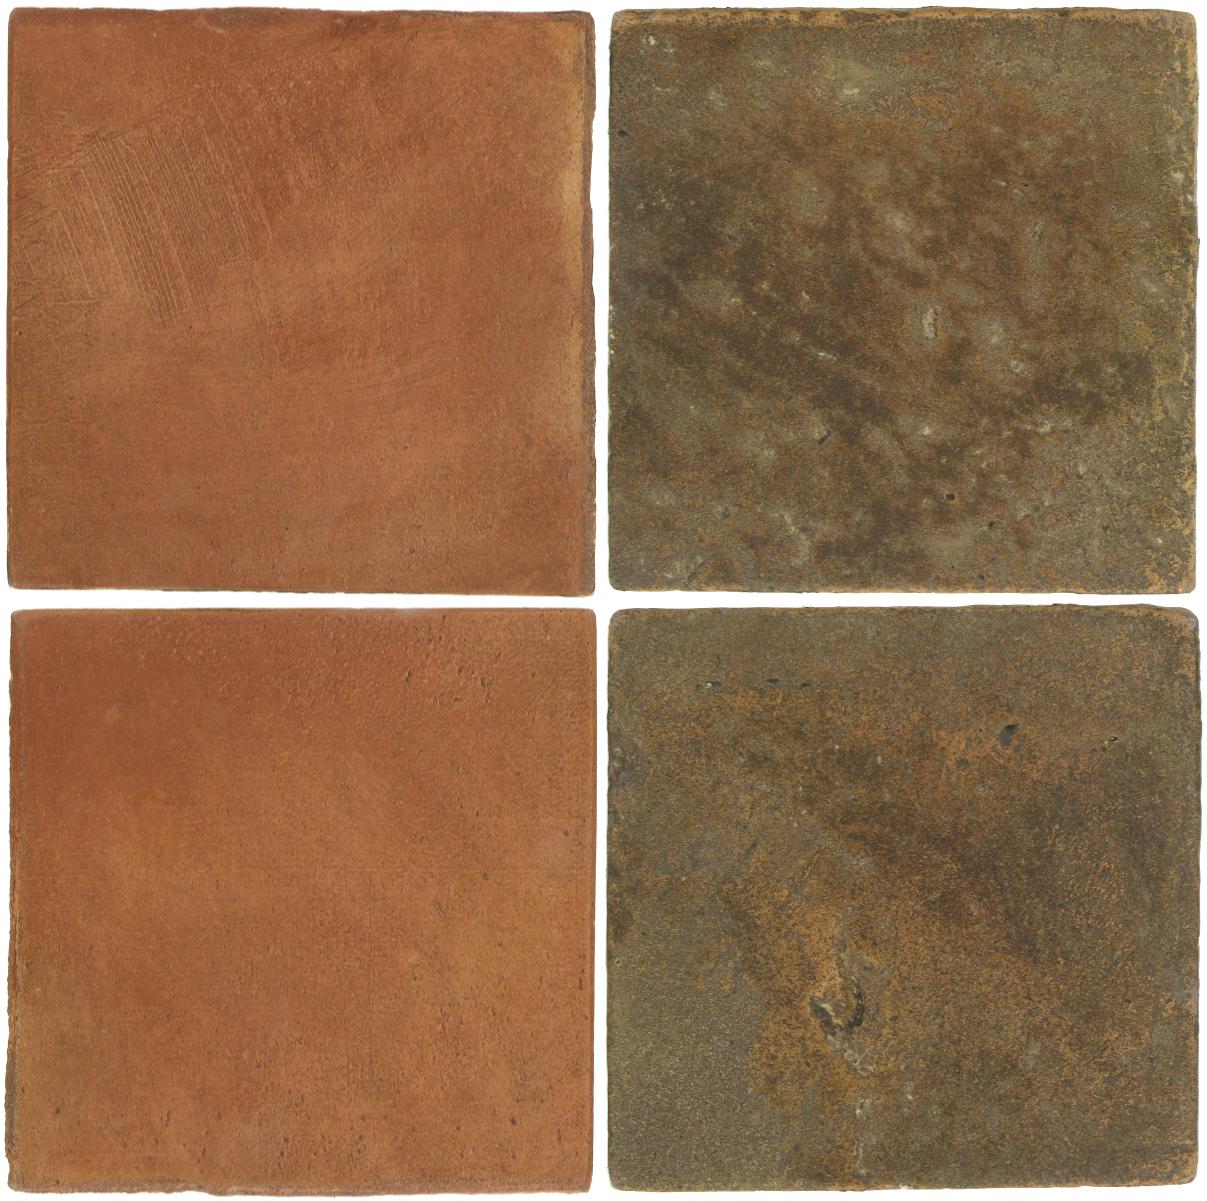 Pedralbes Antique Terracotta  2 Color Combinations  OHS-PSTR Traditional + VTG-PSVN Verona Brown